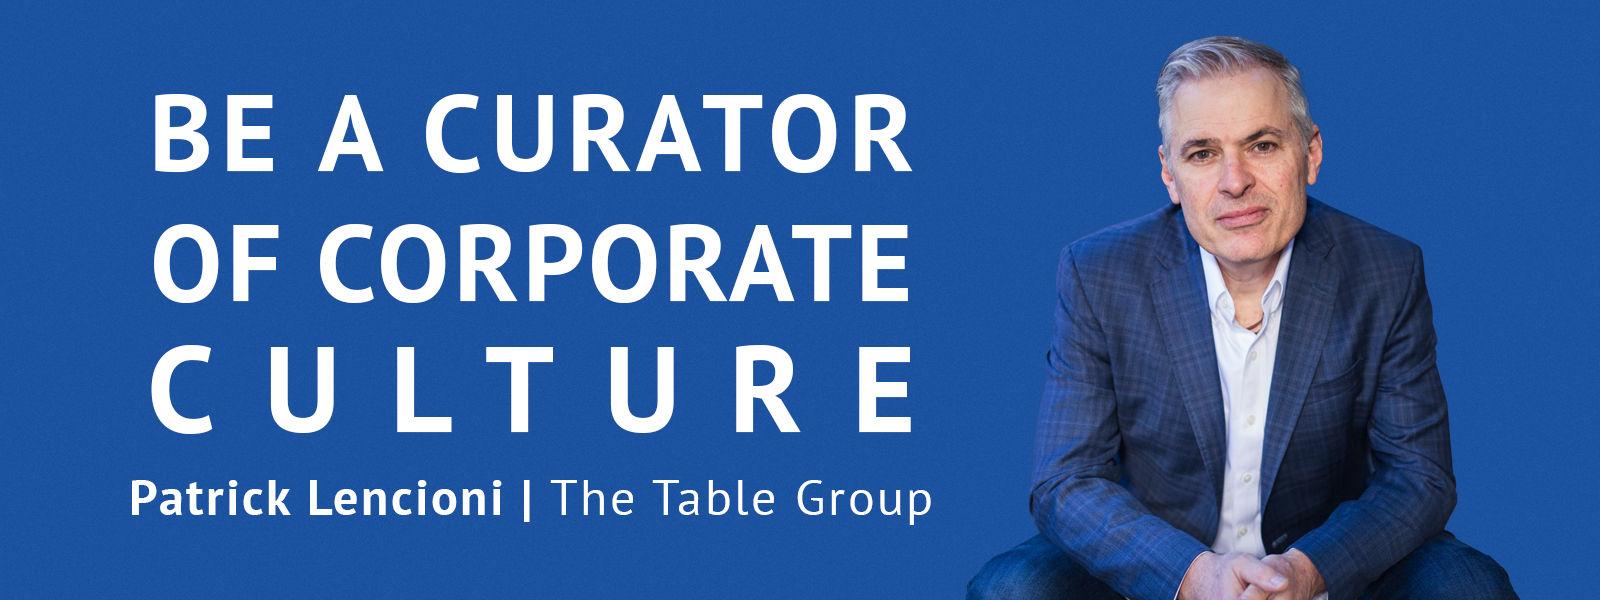 Be a Curator of Corporate Culture